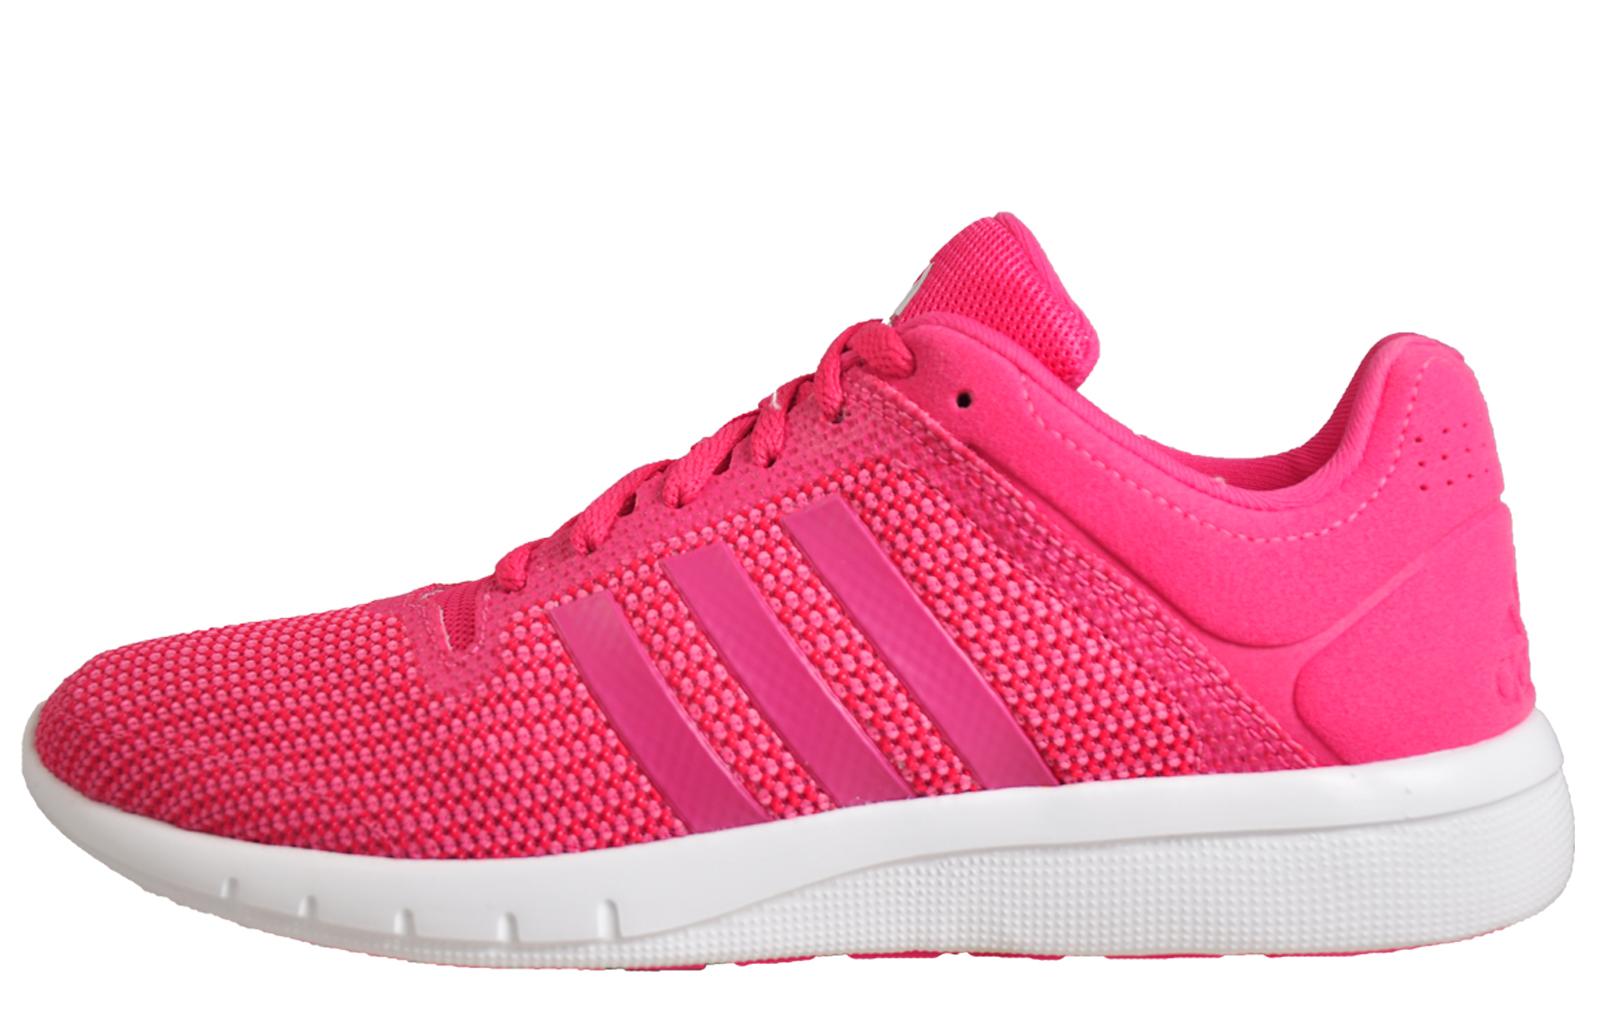 reputable site bfec6 20cad Adidas Climacool CC Fresh 2 Womens - AD176032